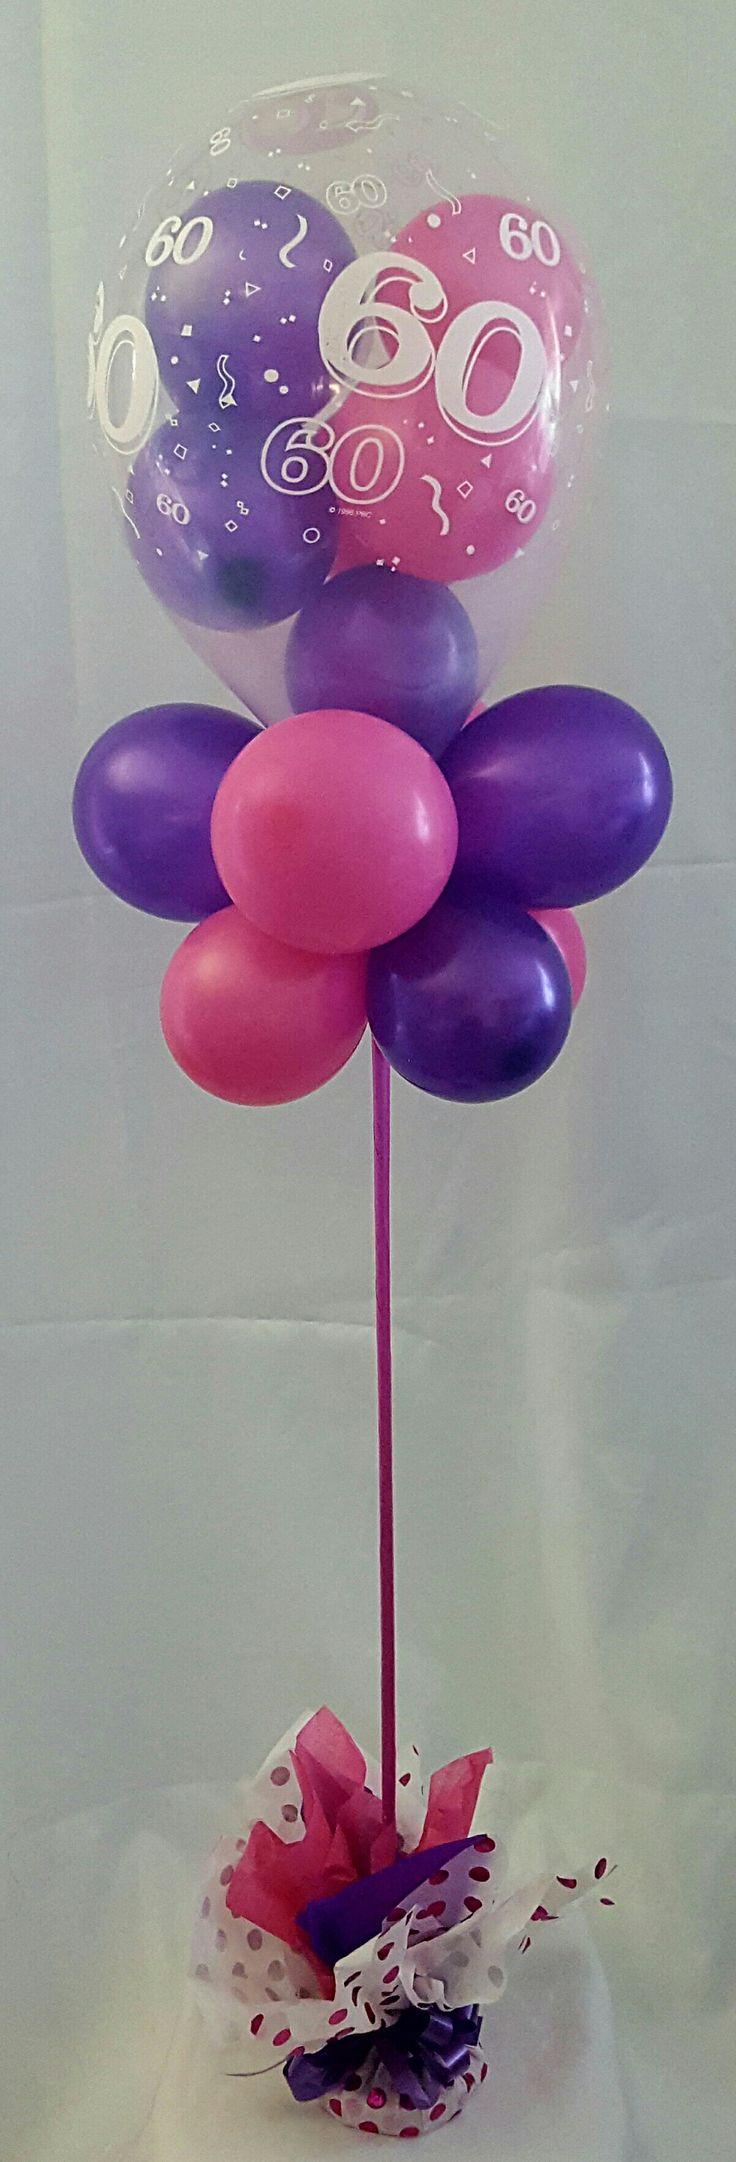 60th balloon topiary with little balloons inside latex balloon #partysolutions #huntervalley